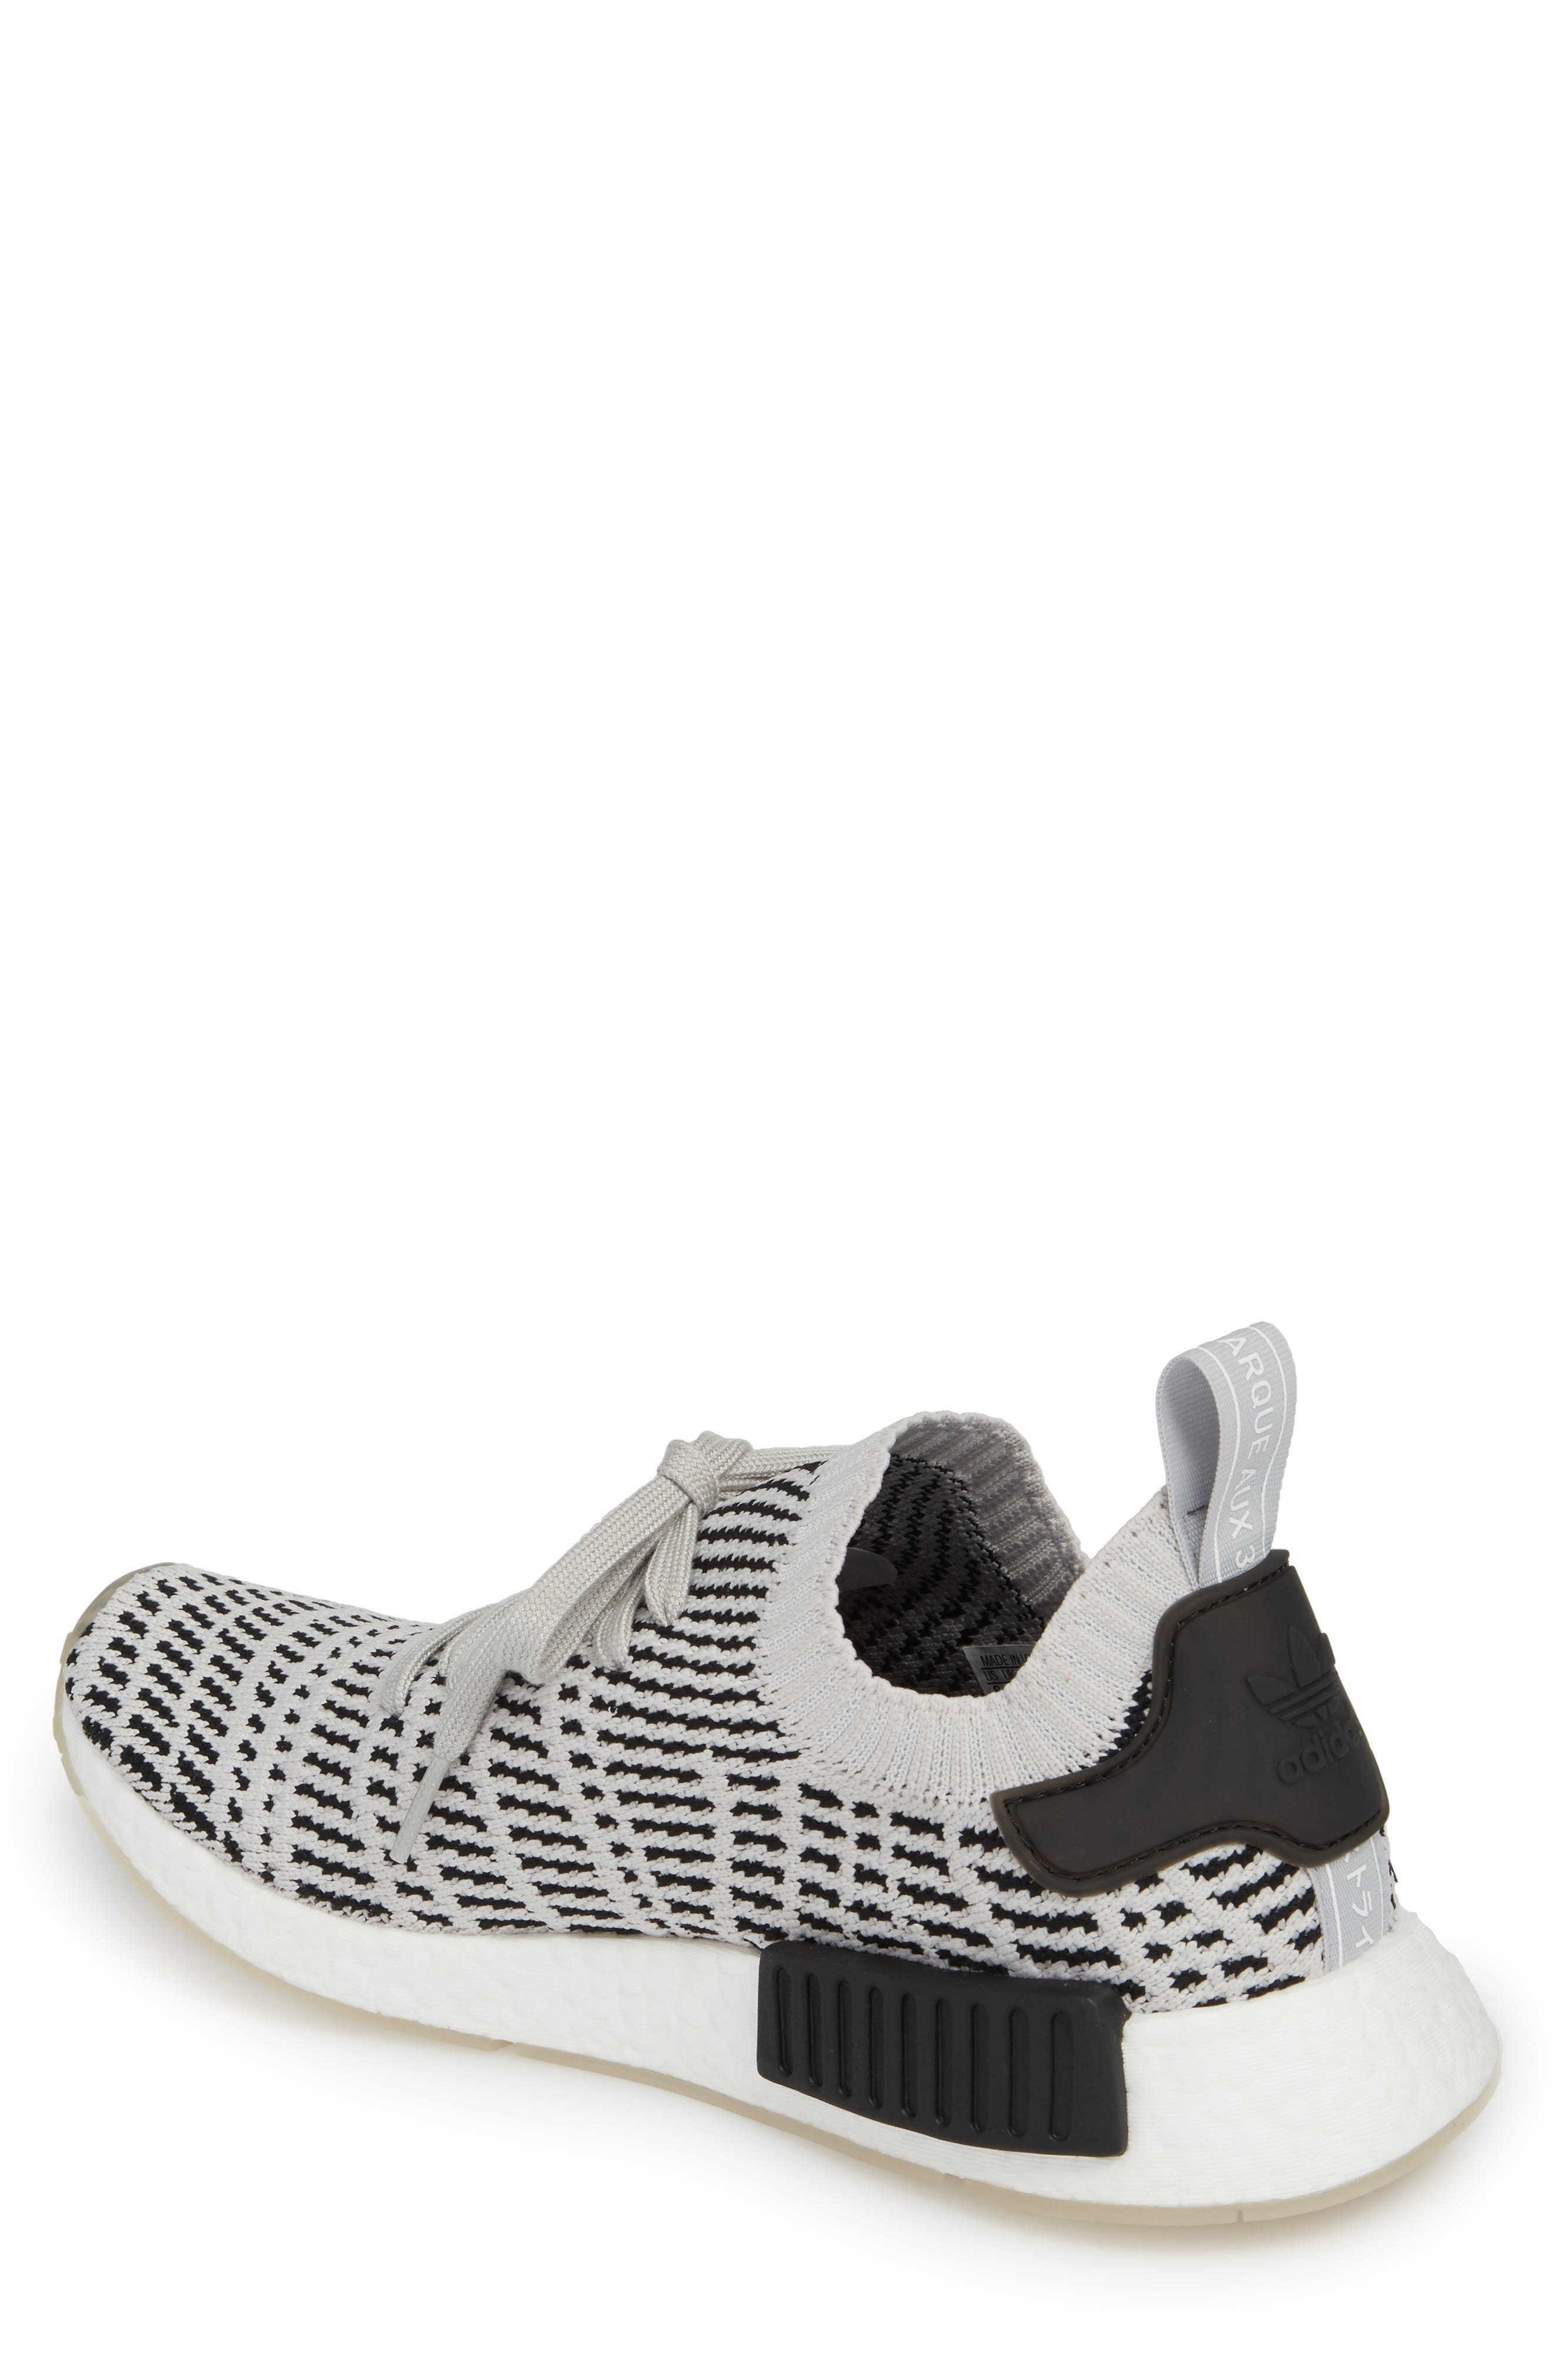 NMD R1 STLT Primeknit Sneaker,                             Alternate thumbnail 2, color,                             033